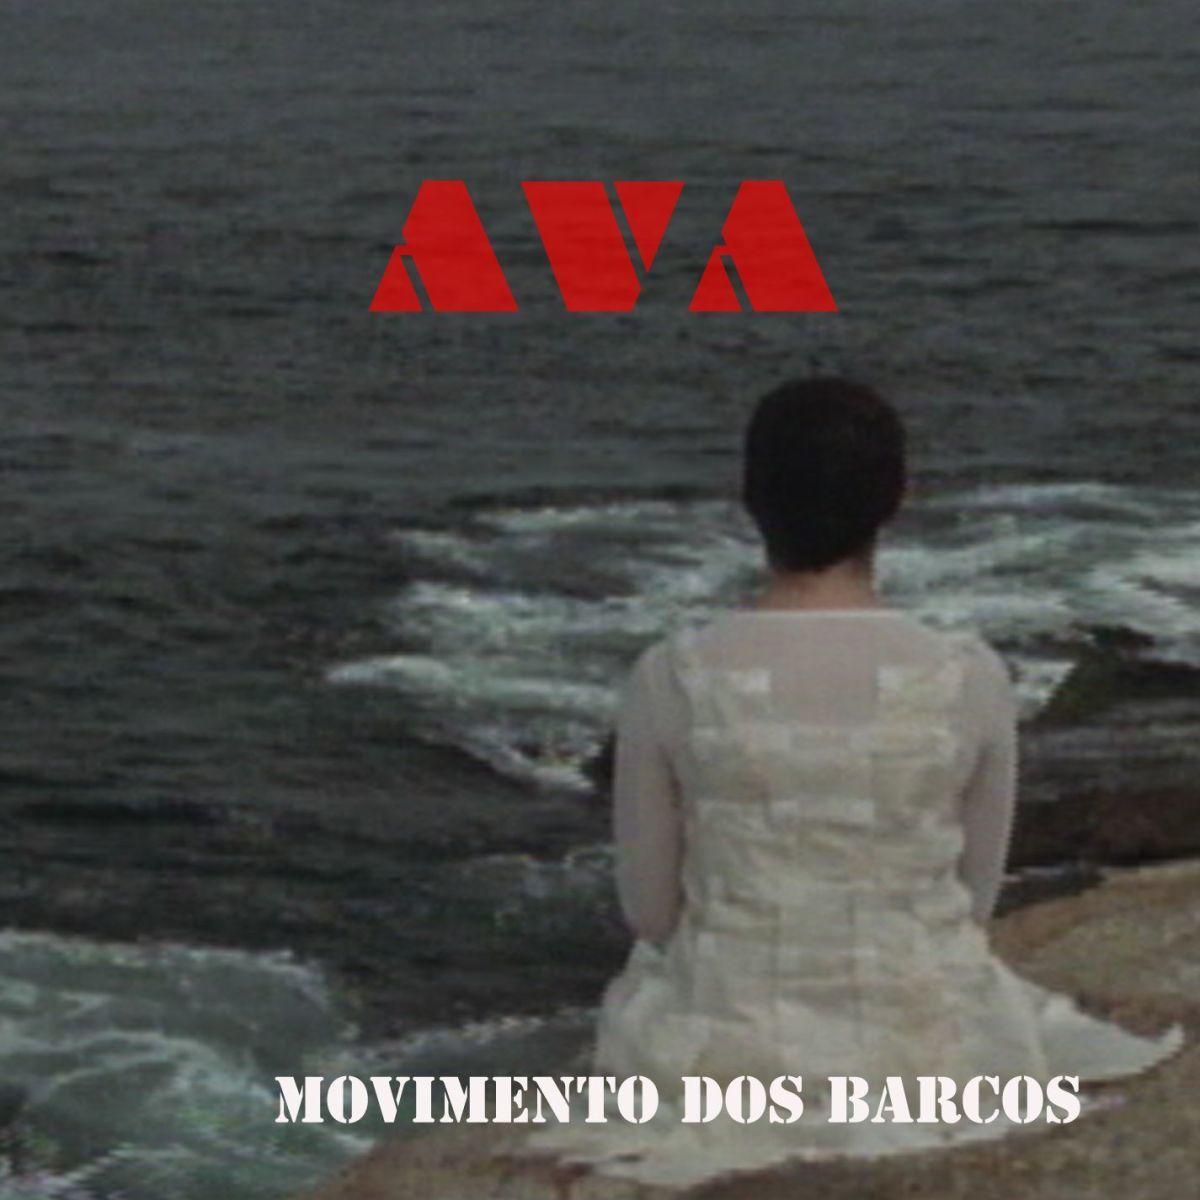 Ava - Movimento dos Barcos (Single)